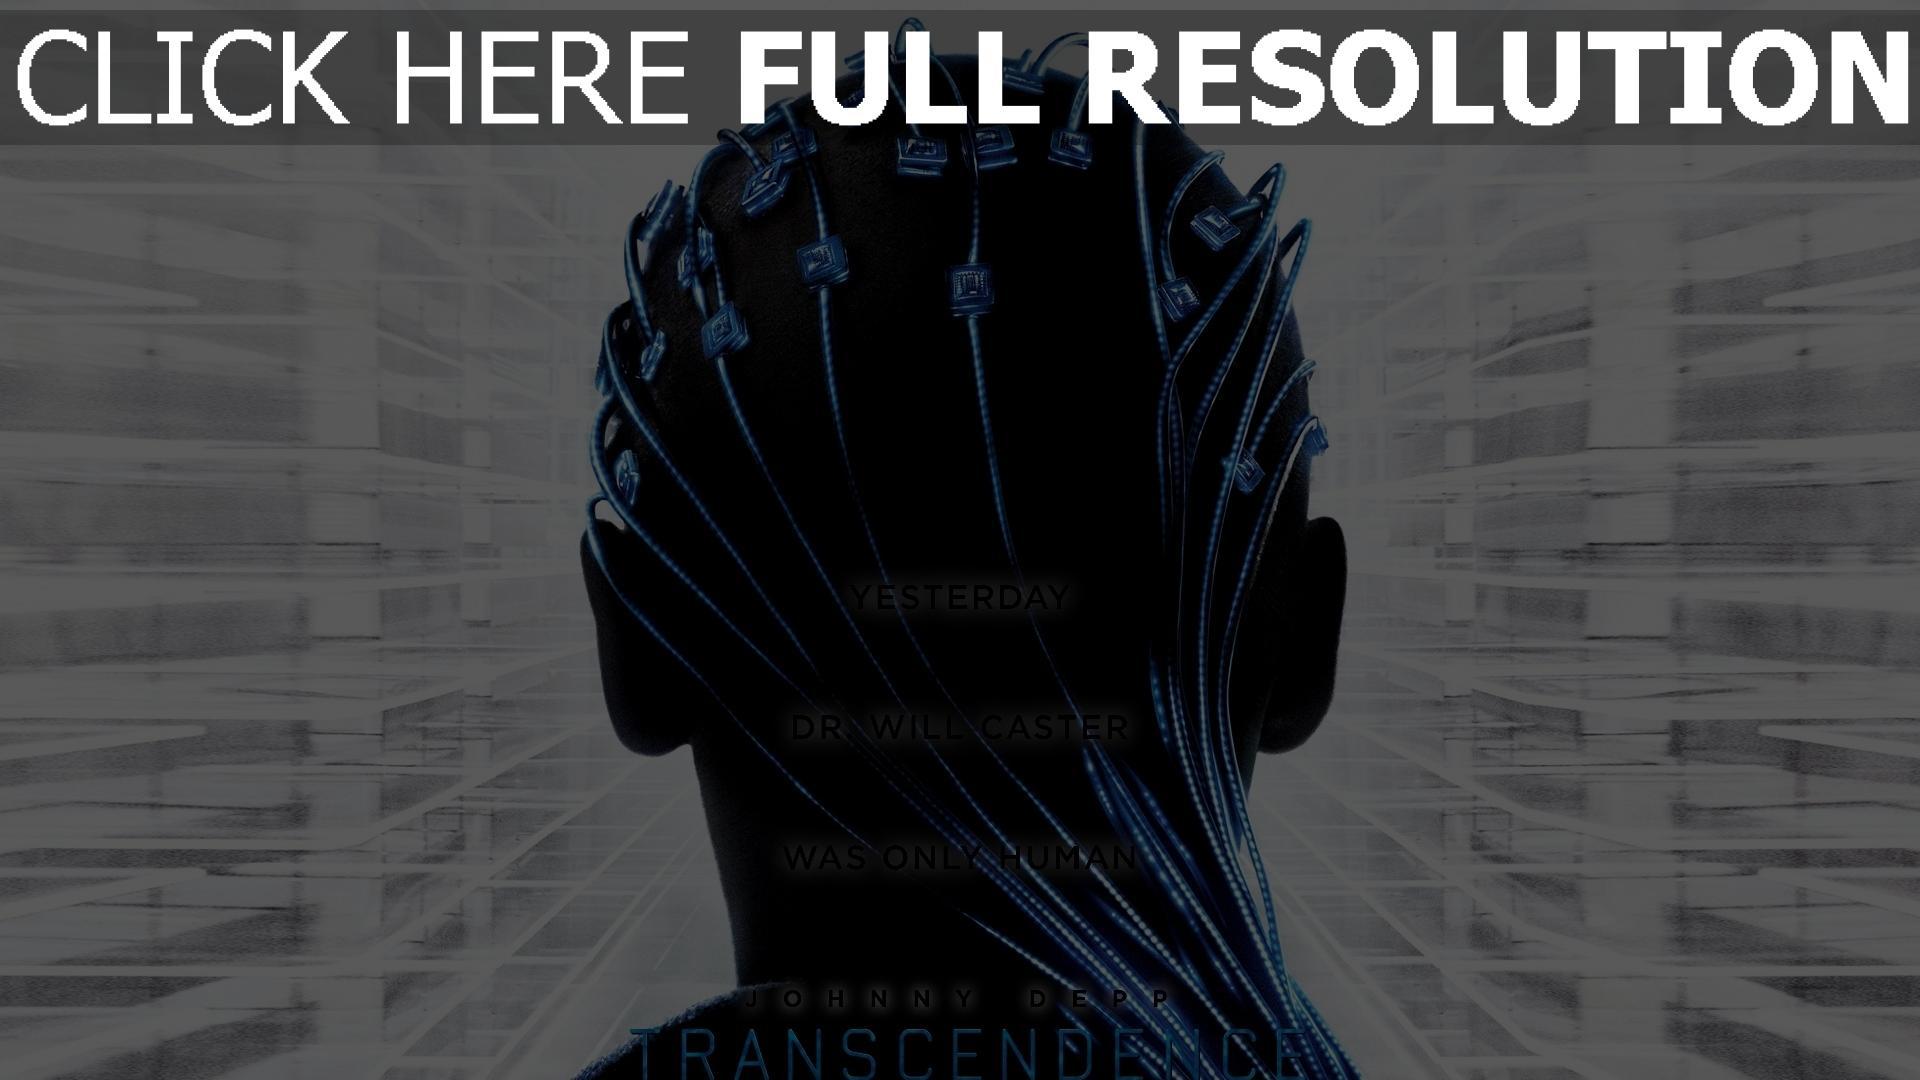 Transzendenz Film